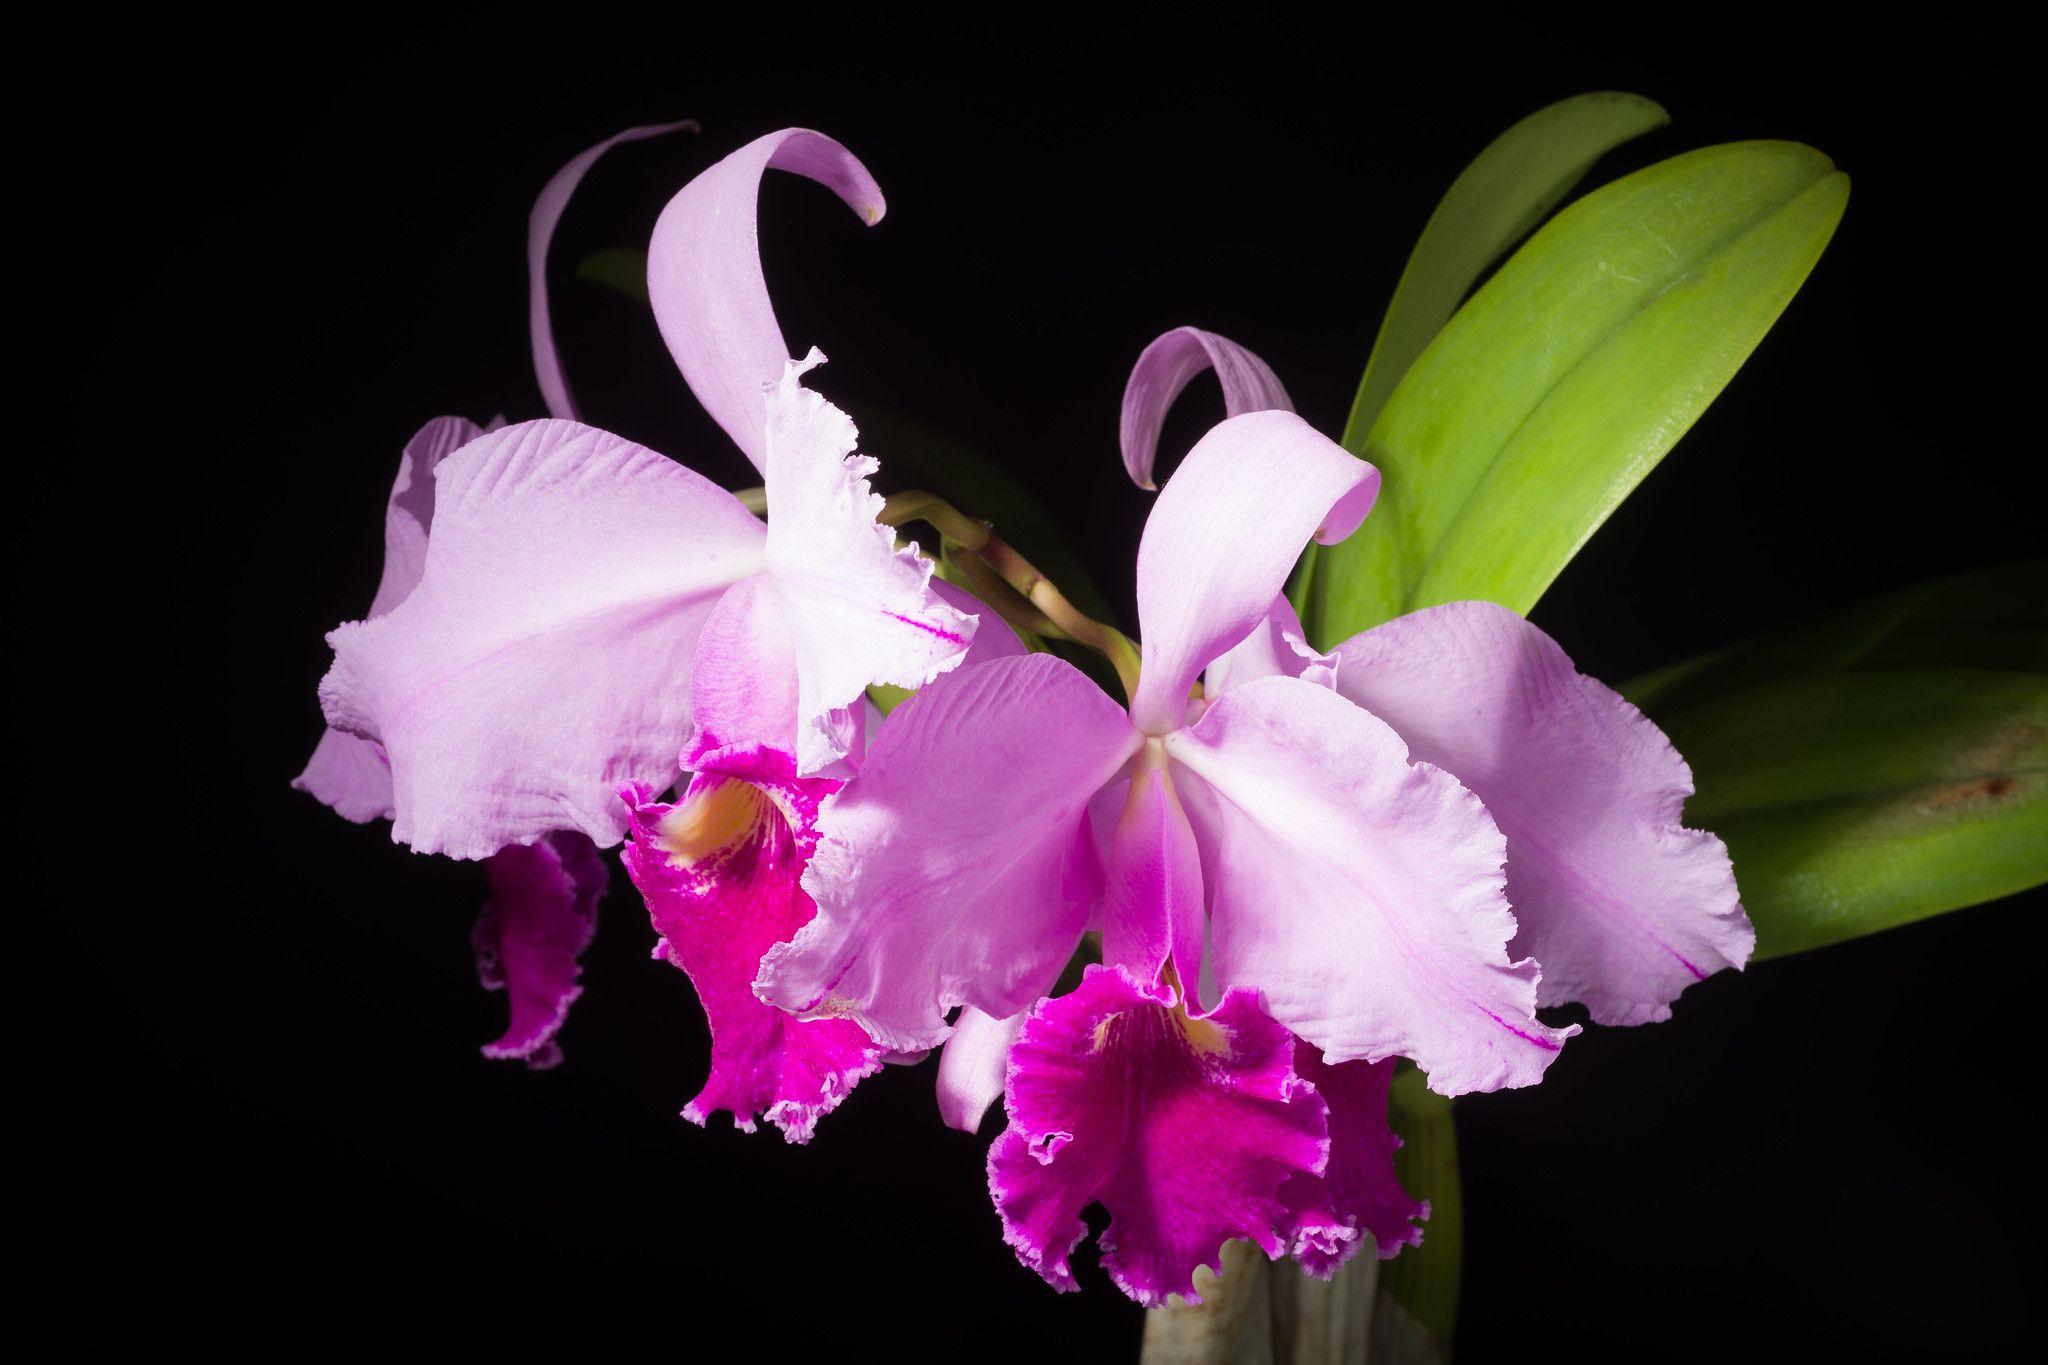 Colombia Cattleya Warscewiczii Fma Aquinii Gigante De Cuiete Rchb F Bonplandia Hannover 2 112 1854 Cattleya Orchidaceae Orchids